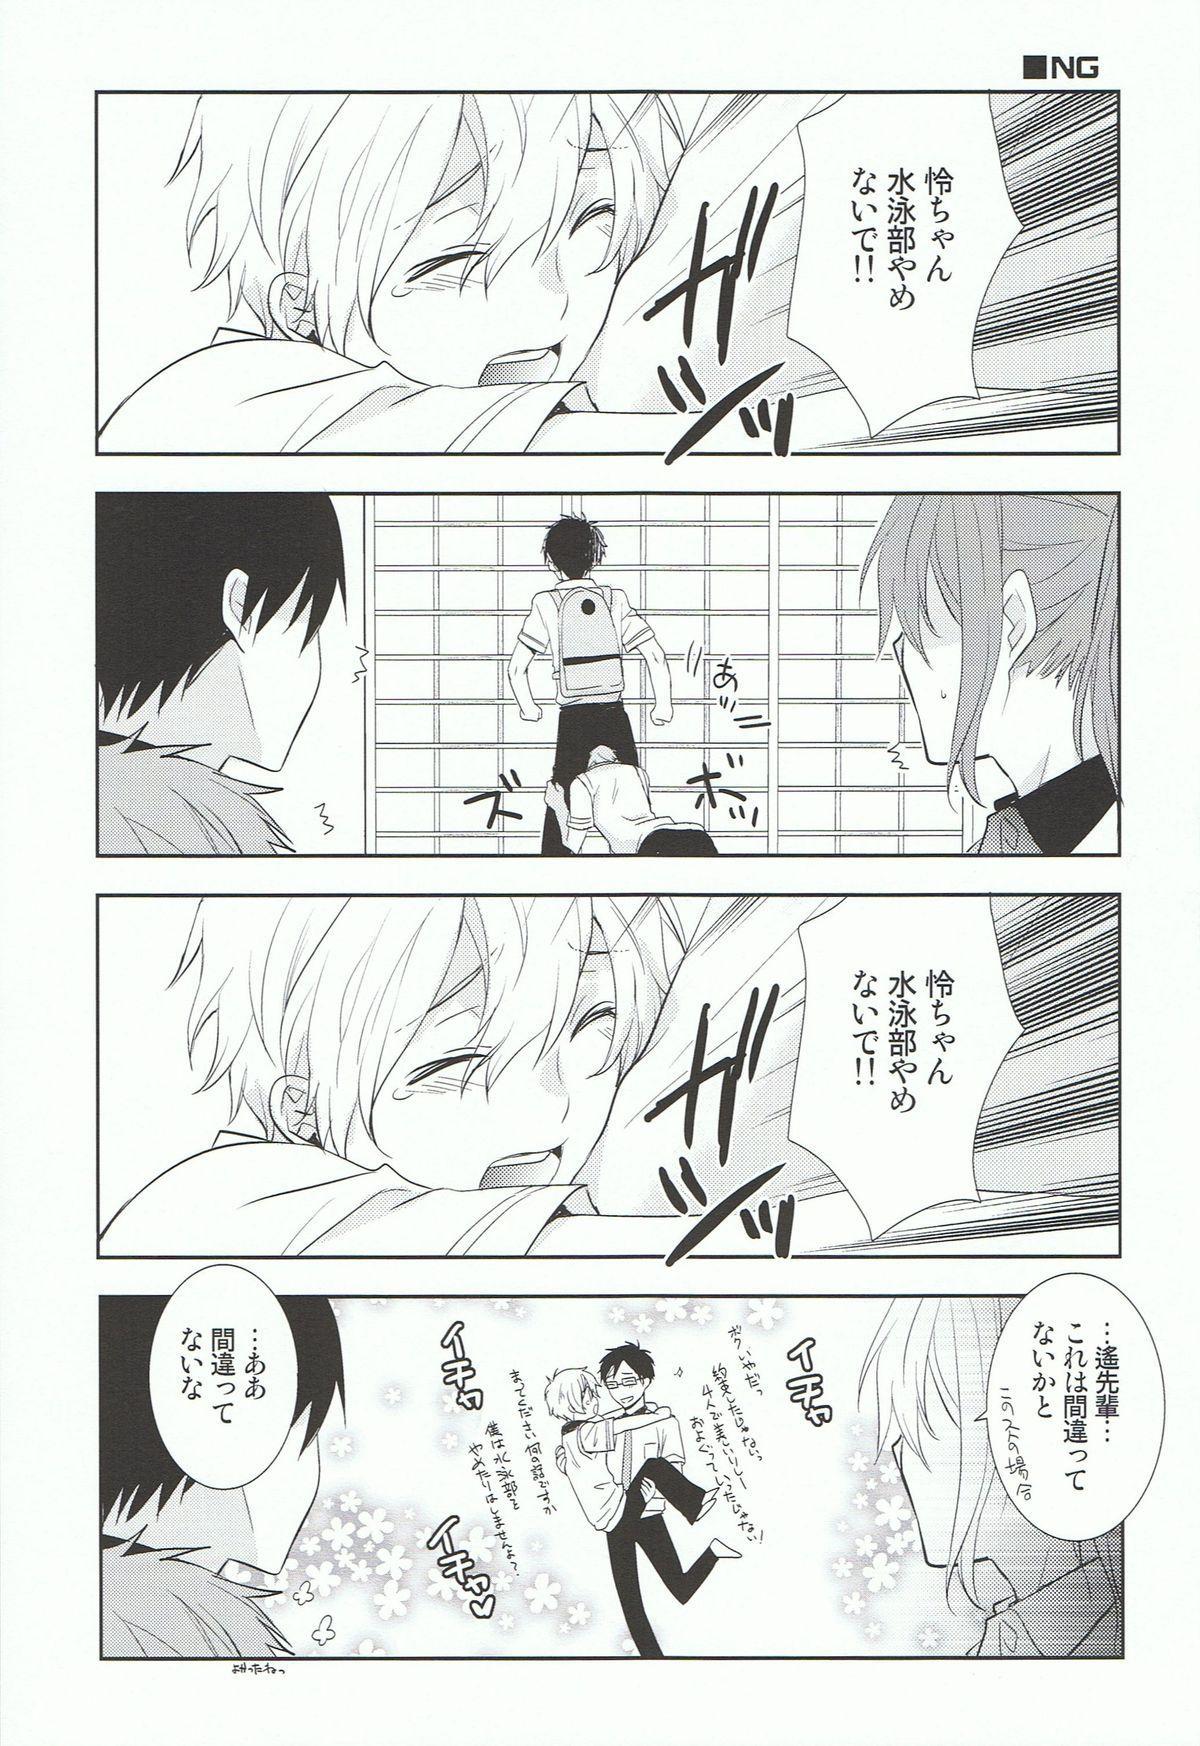 Nagisa-kun de ii deshou! 19